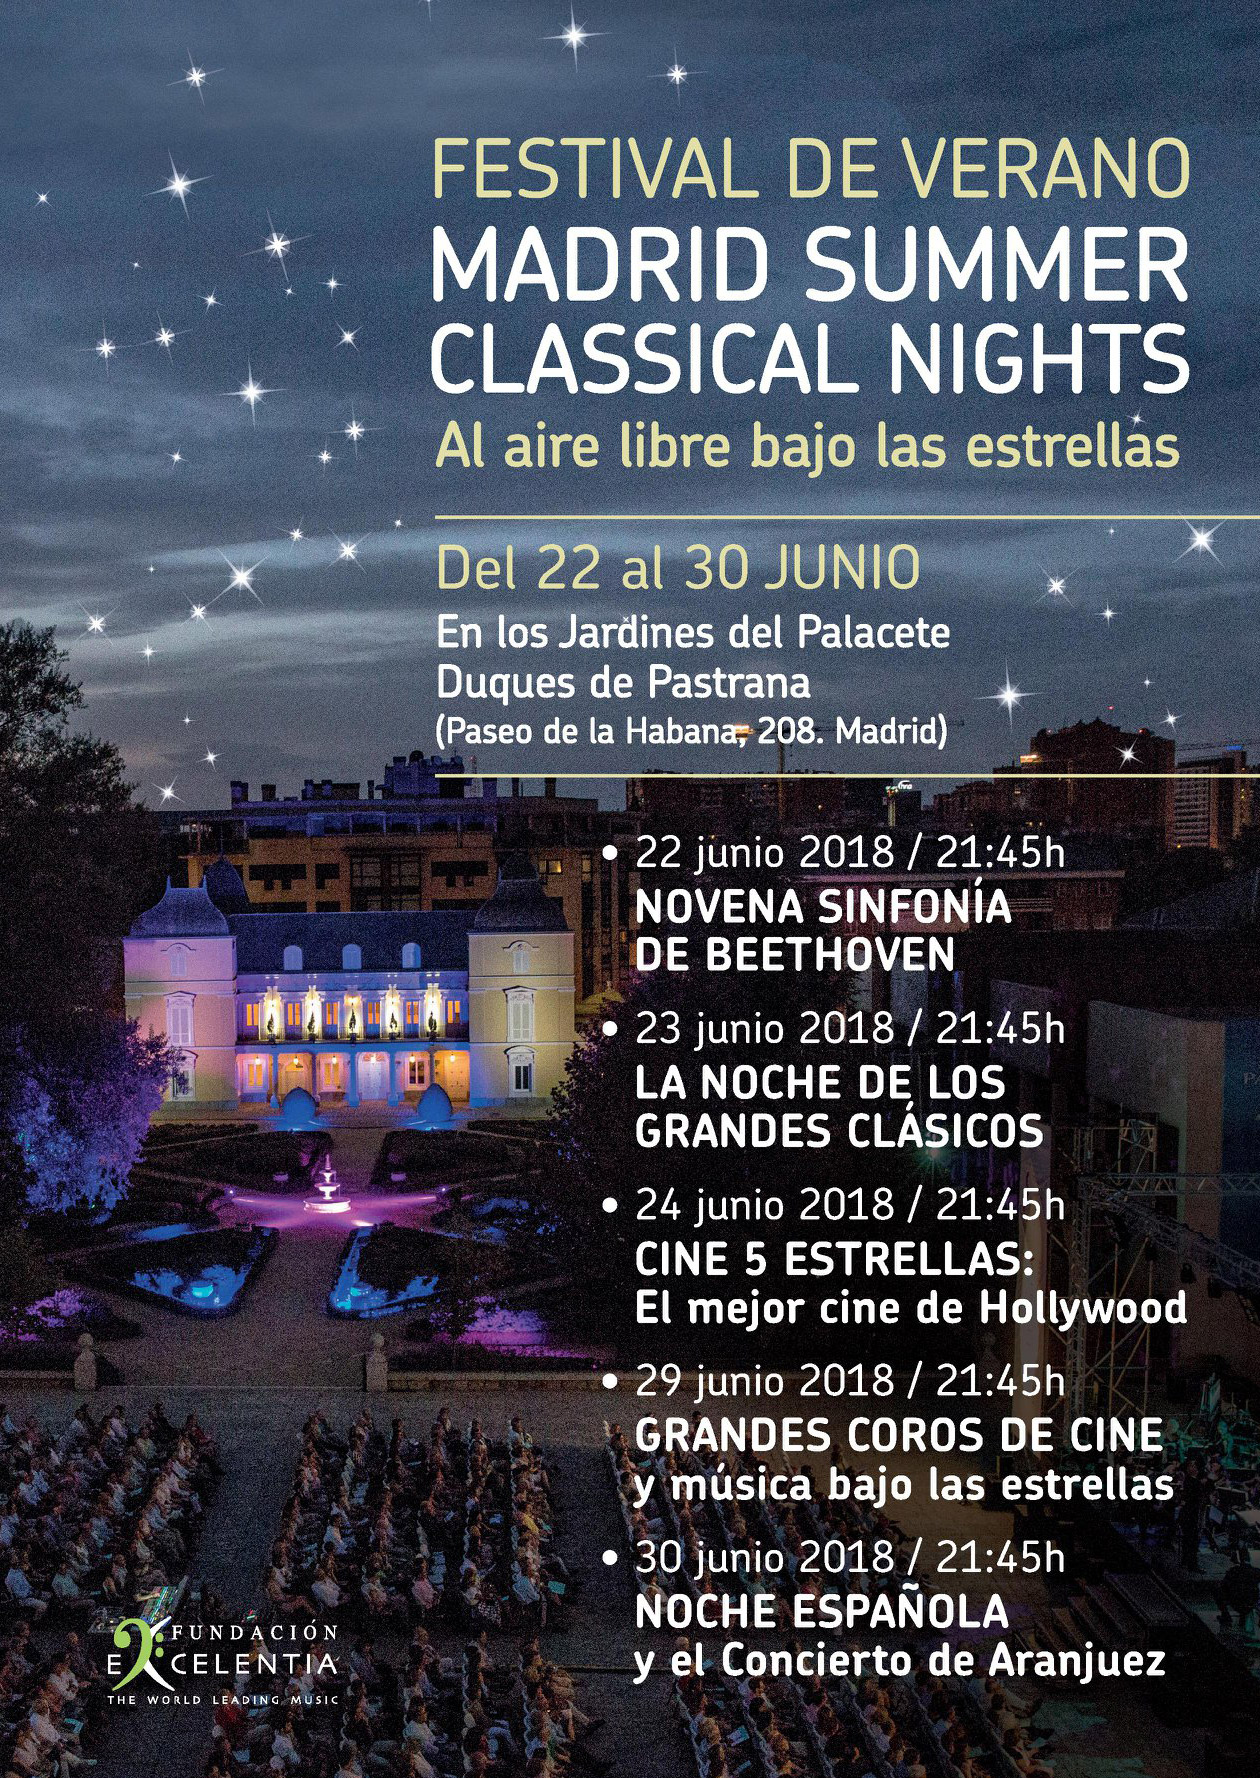 Festival-de-Verano---Madrid-Summer-Classical-Nights